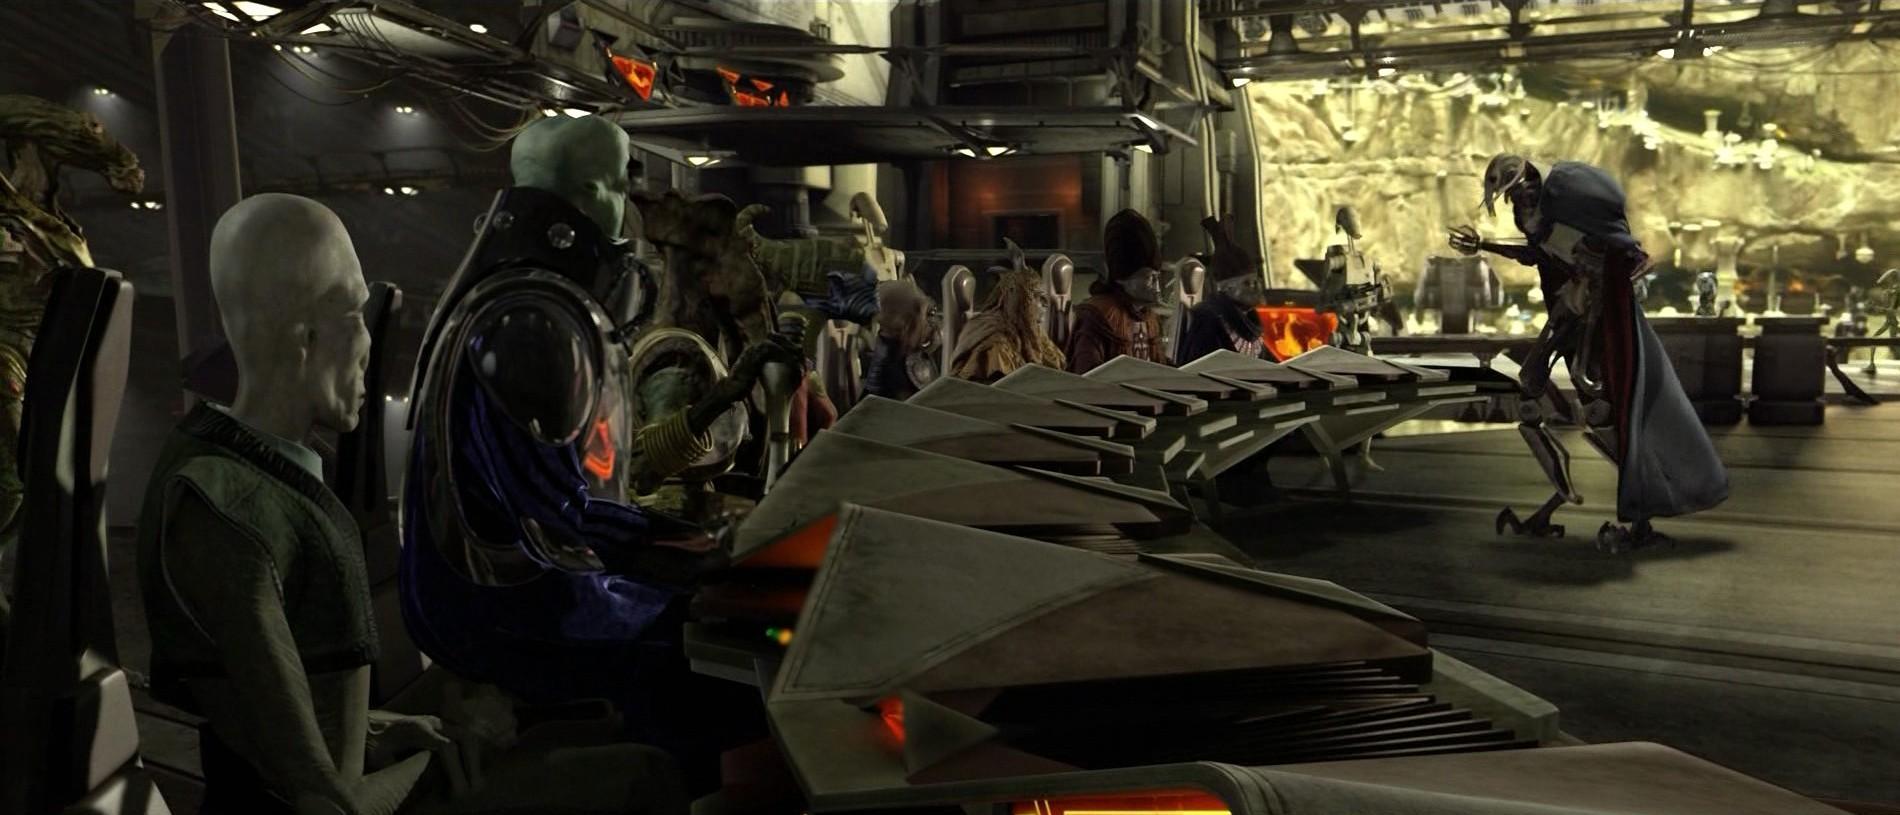 star_wars_episode_iii_chapter_21_the_separatist_council_on_utapau.jpg